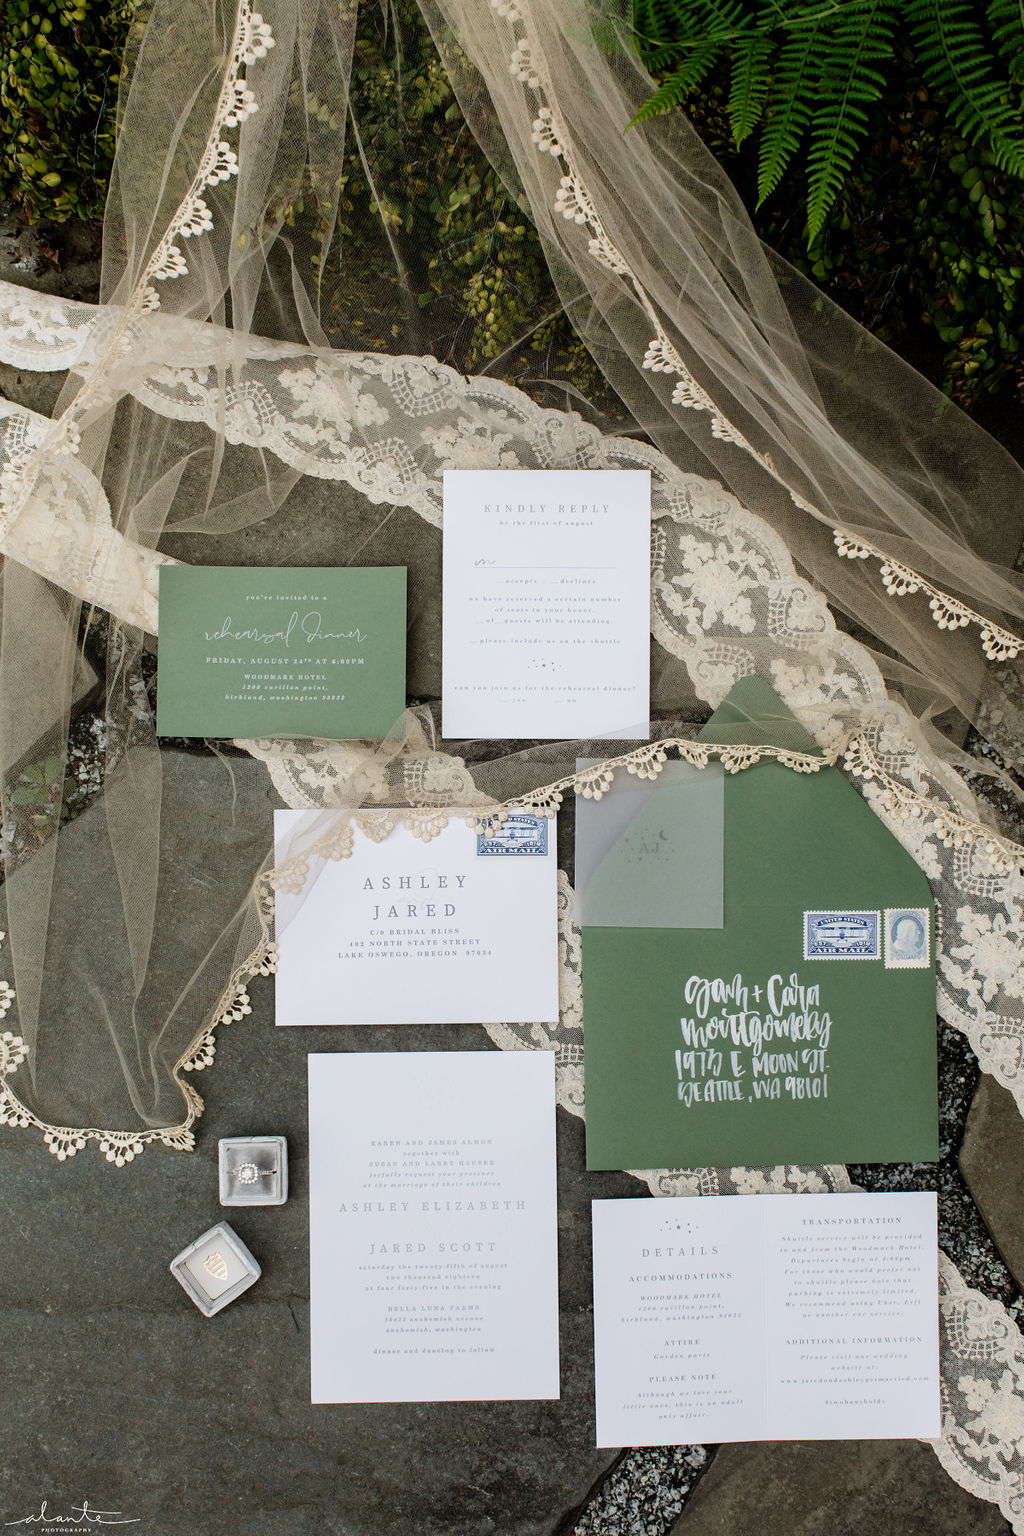 Bridalbliss.com   Seattle Wedding   Washington Event Coordination and Design   Alante Photography